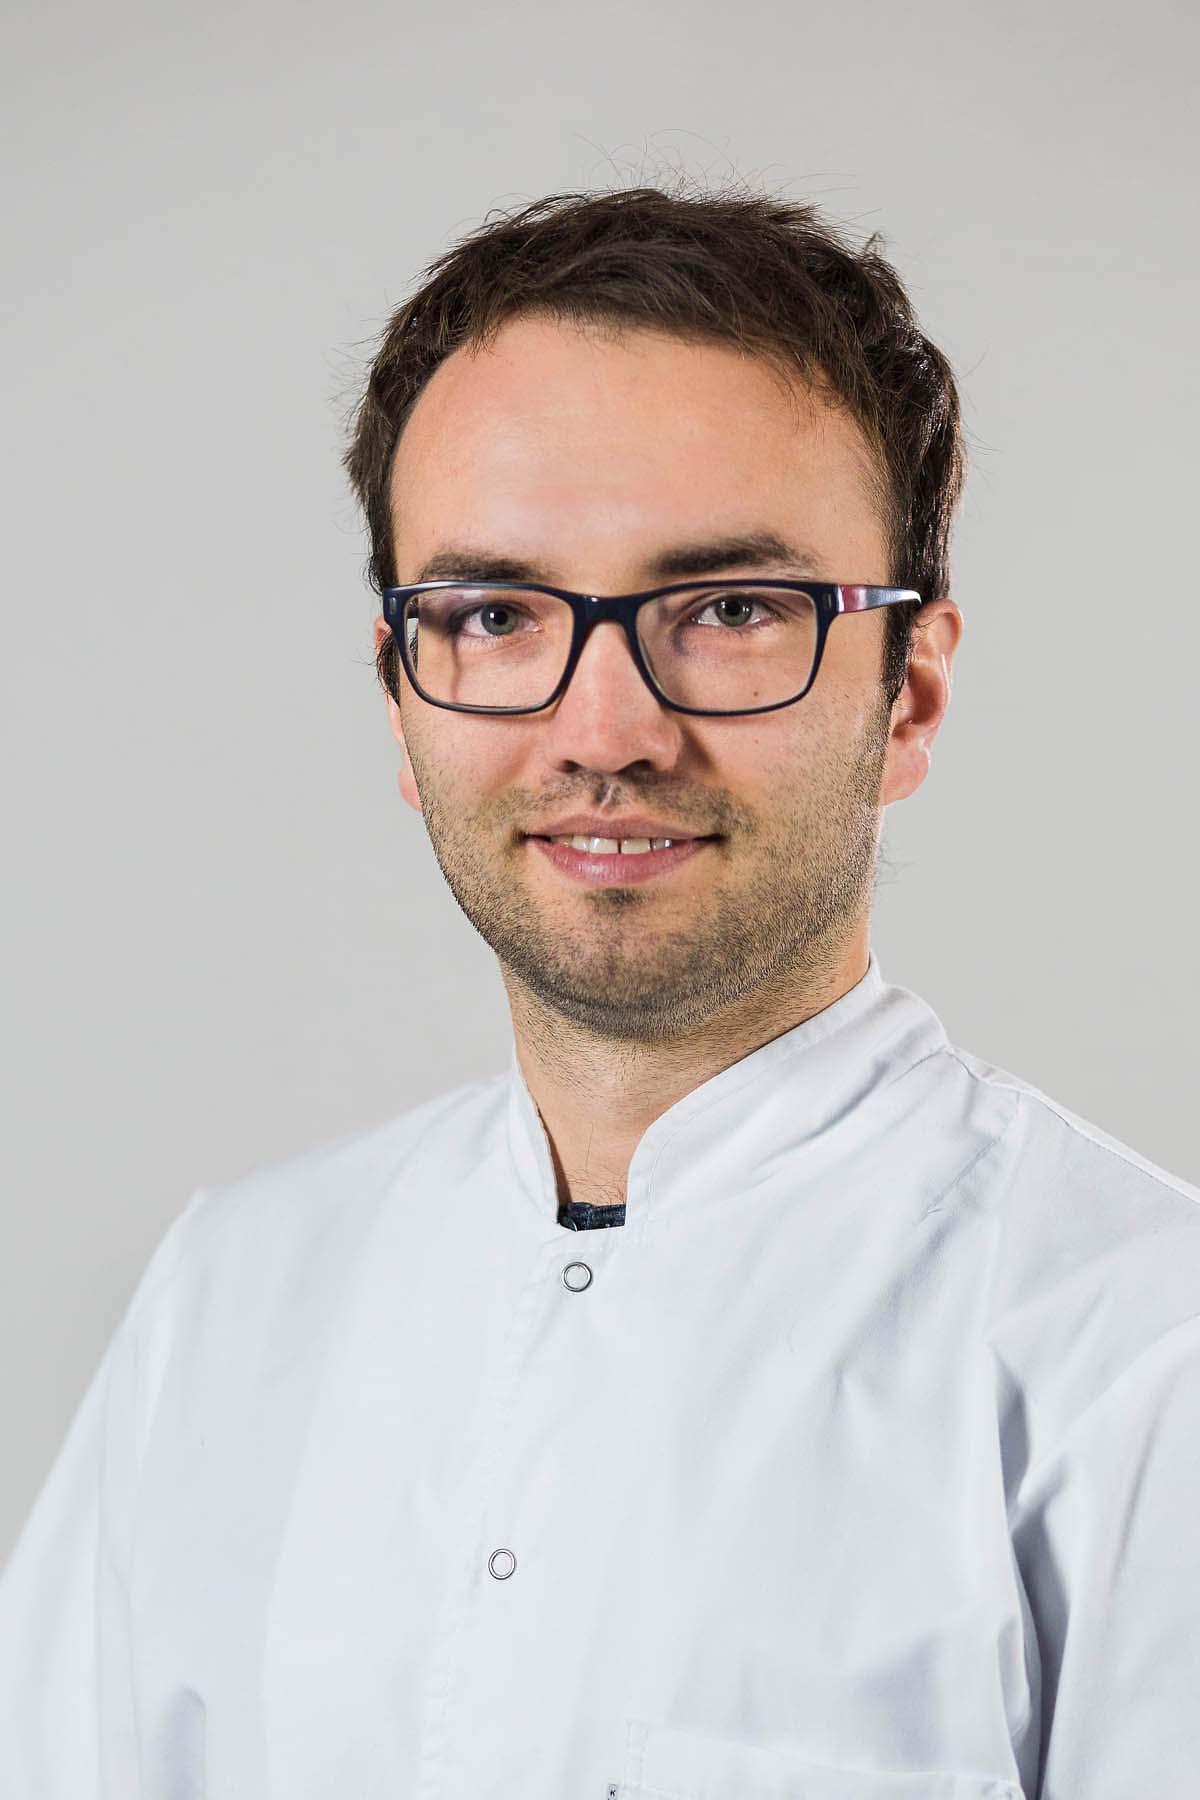 Piotr Sitko